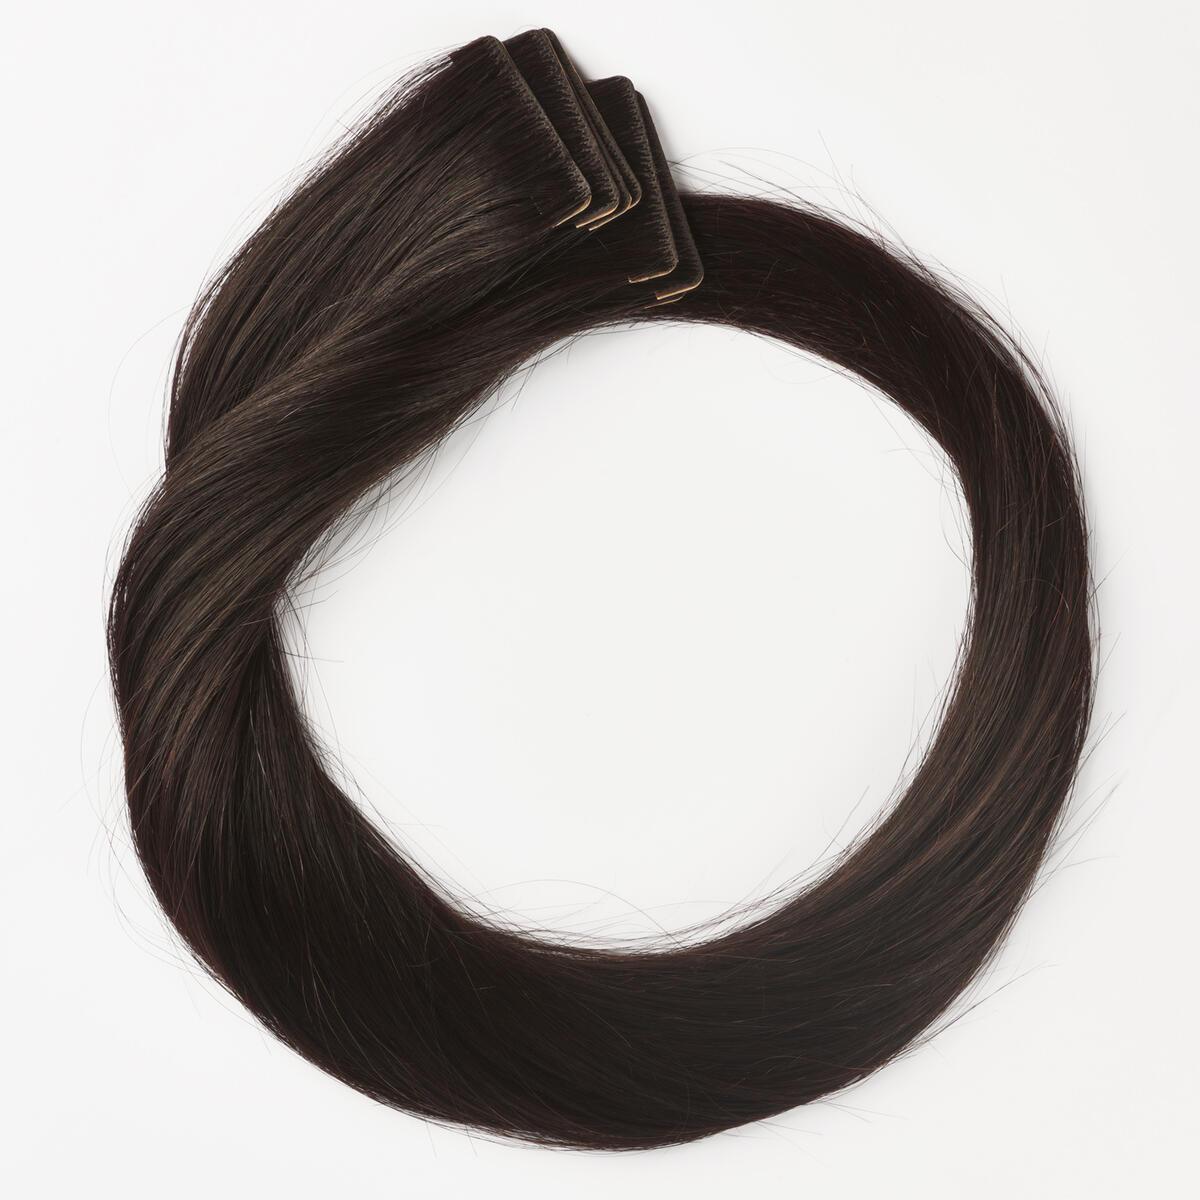 Pro Tape Extension 1.2 Black Brown 50 cm